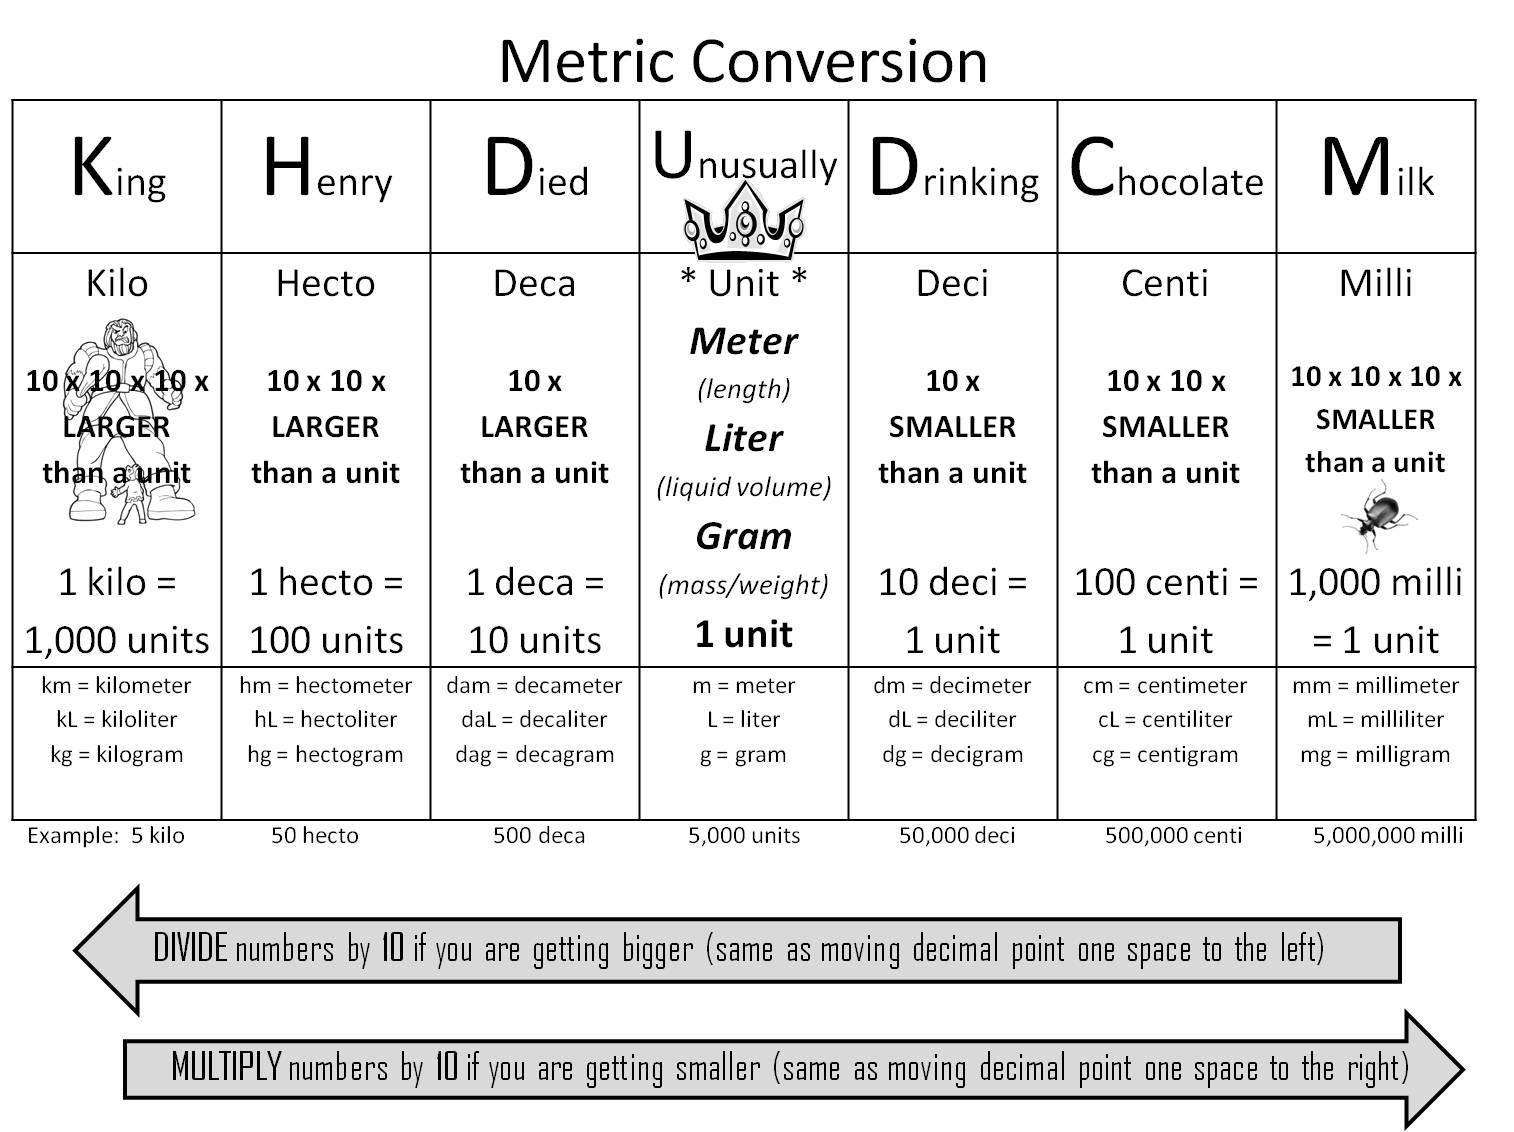 http://luxinterior.xyz/king-henry-metric-conversion-chart